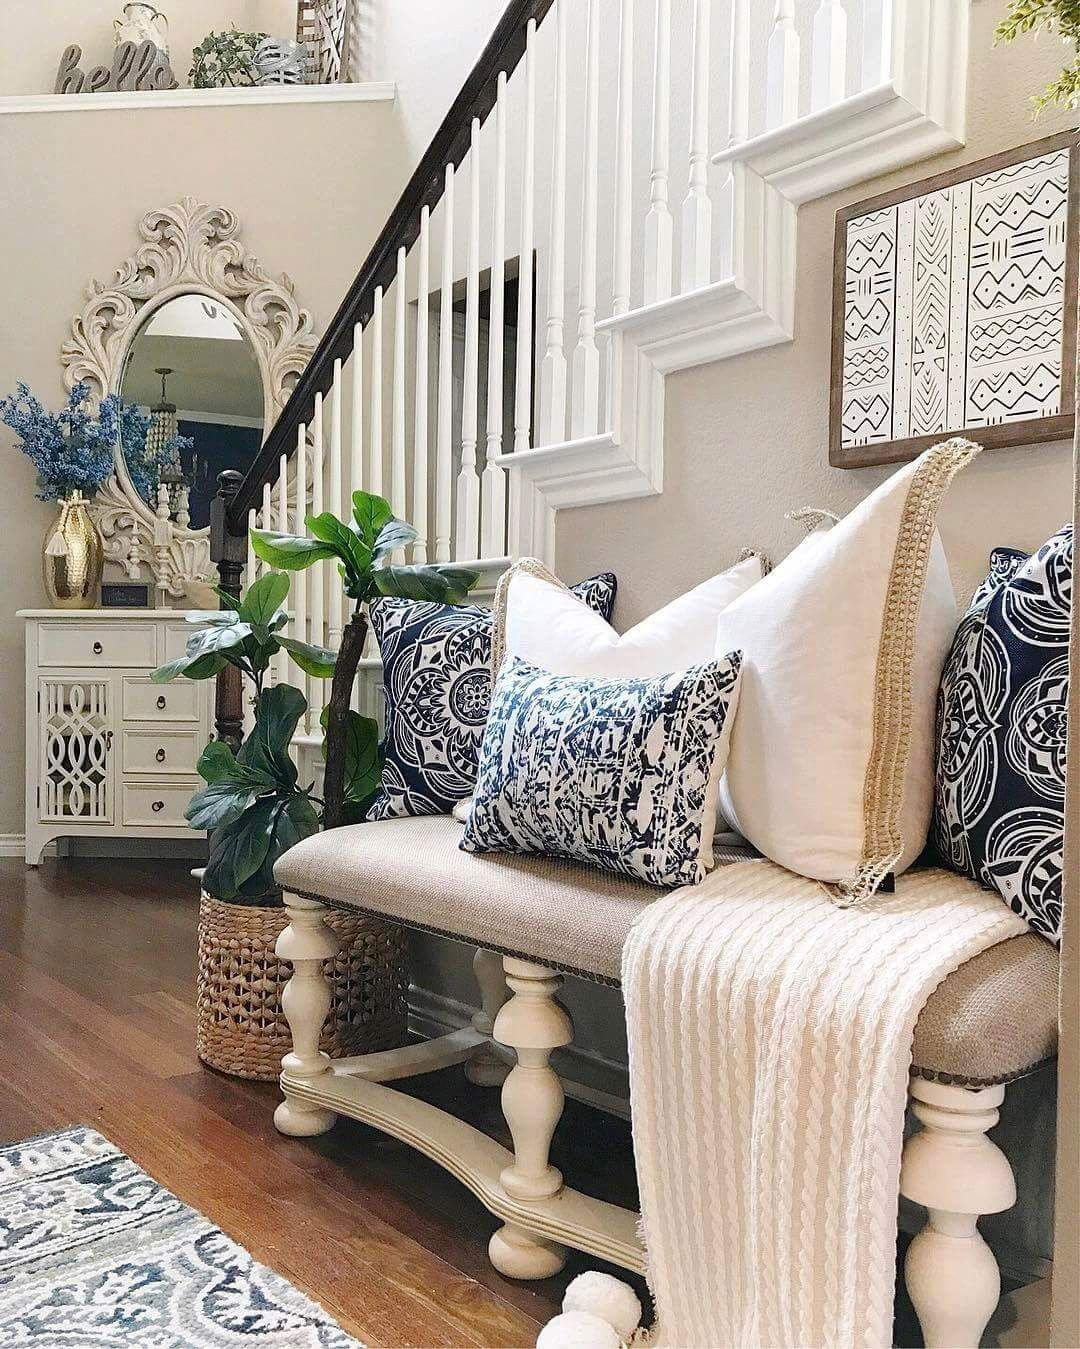 New Homedecorating Ideas: Idea By Deana Rubinchik On Ideas